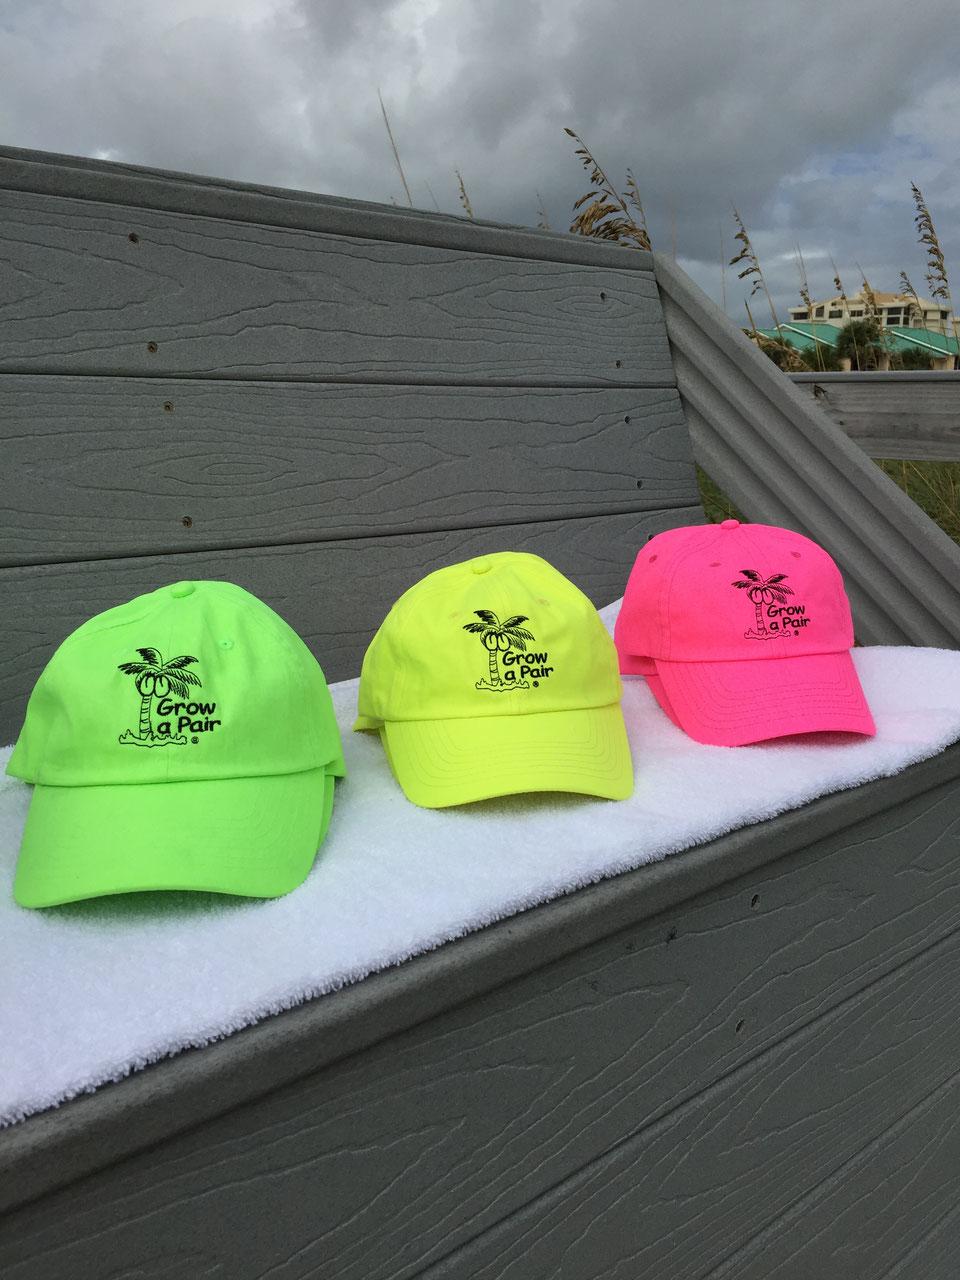 Neon Beach - Beach Lifestyle Clothing and Accessories 1bb10bc5fd55